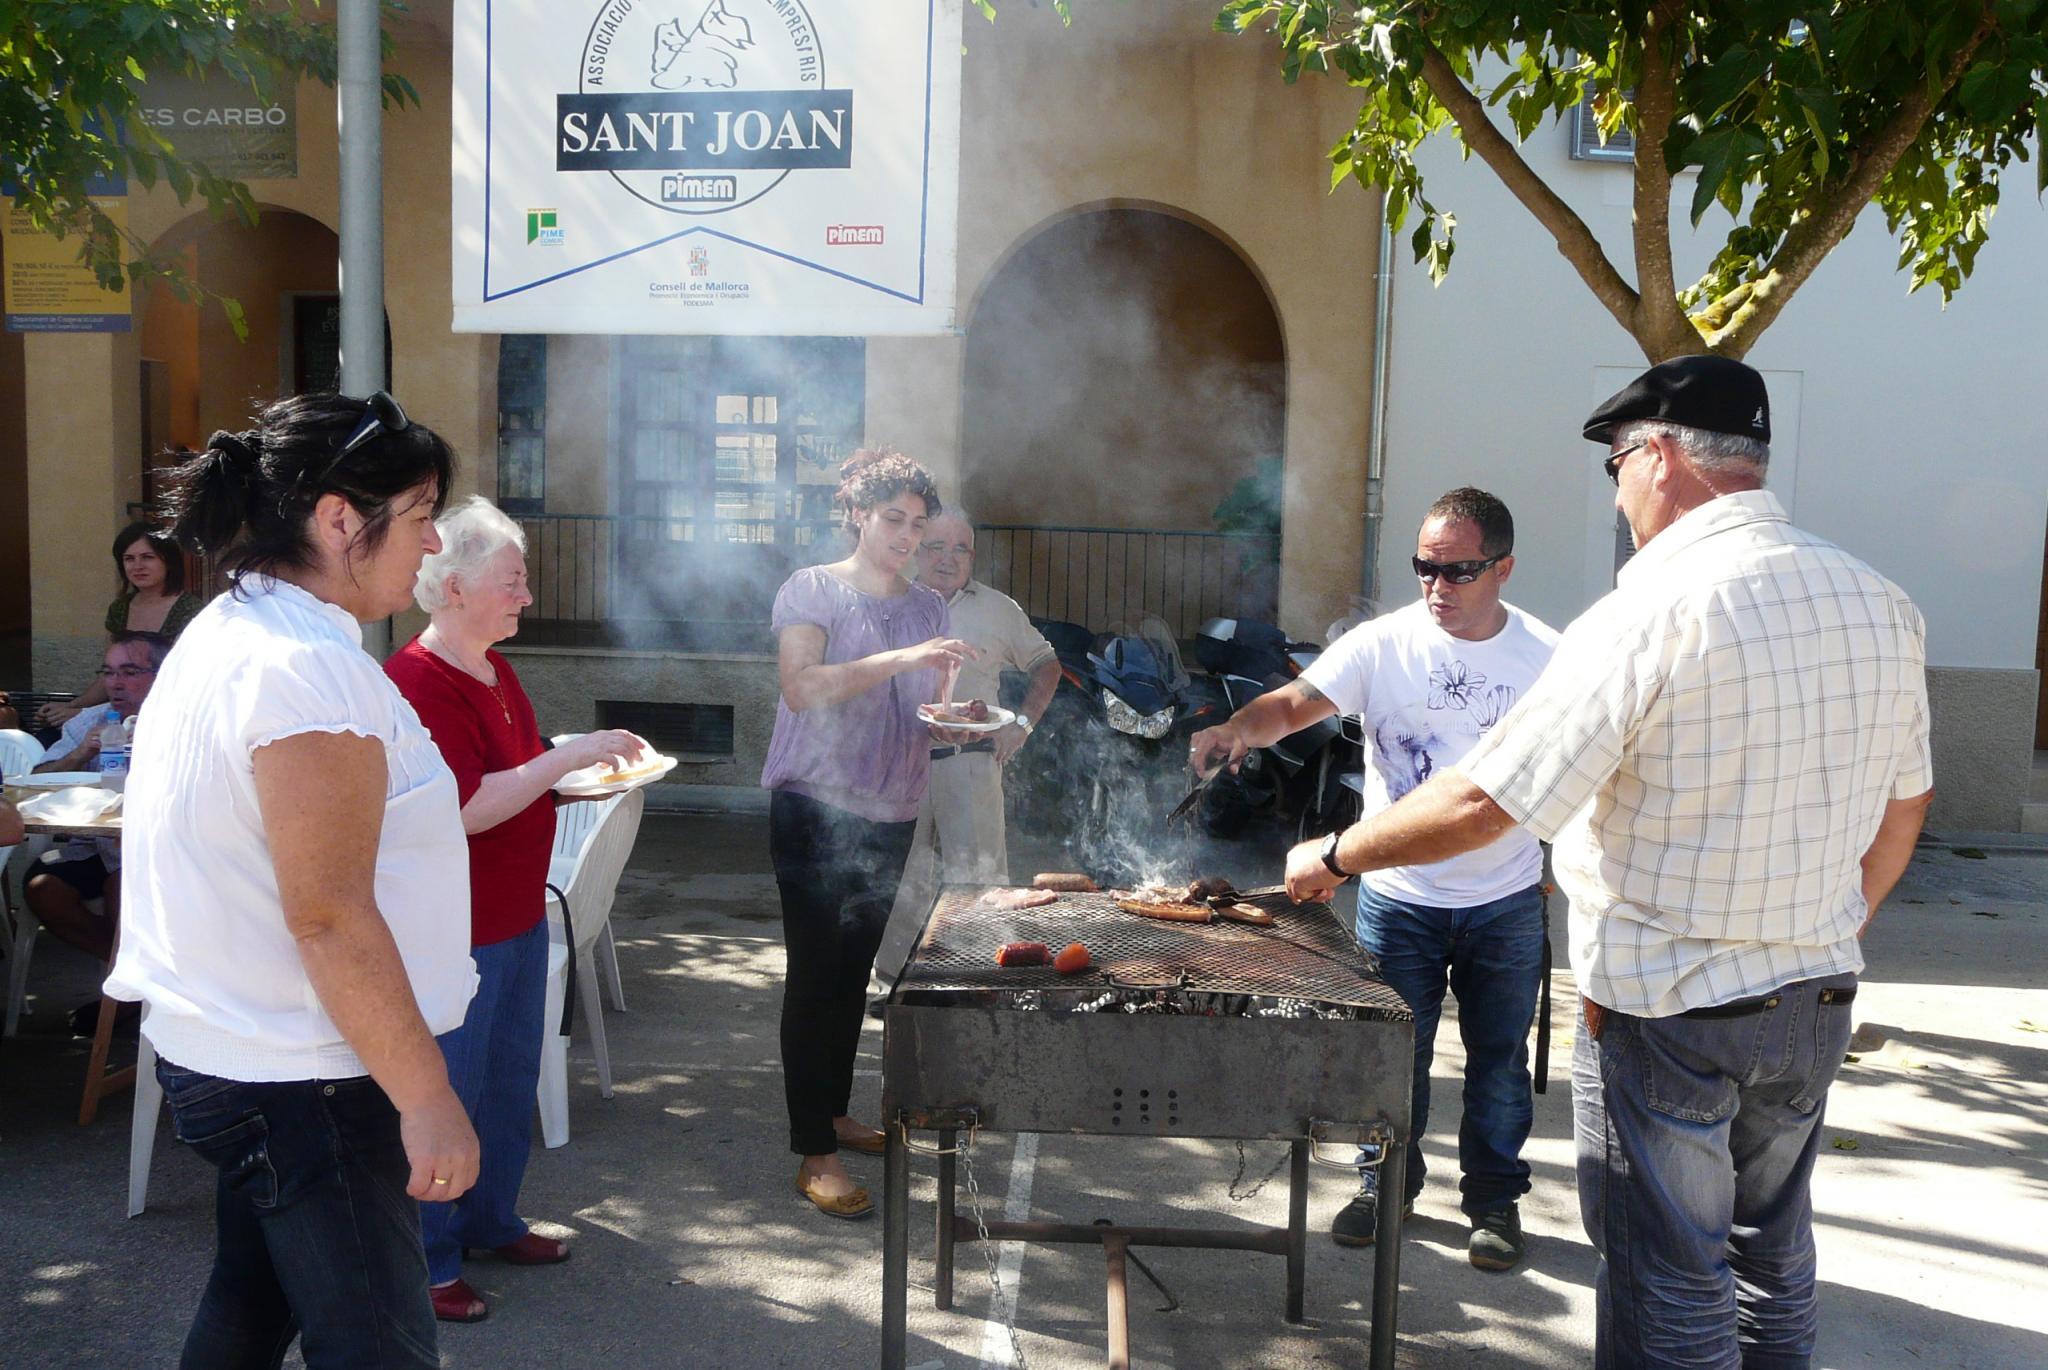 SANT JOAN. FIESTAS PUEBLOS. Festa del botifarró -